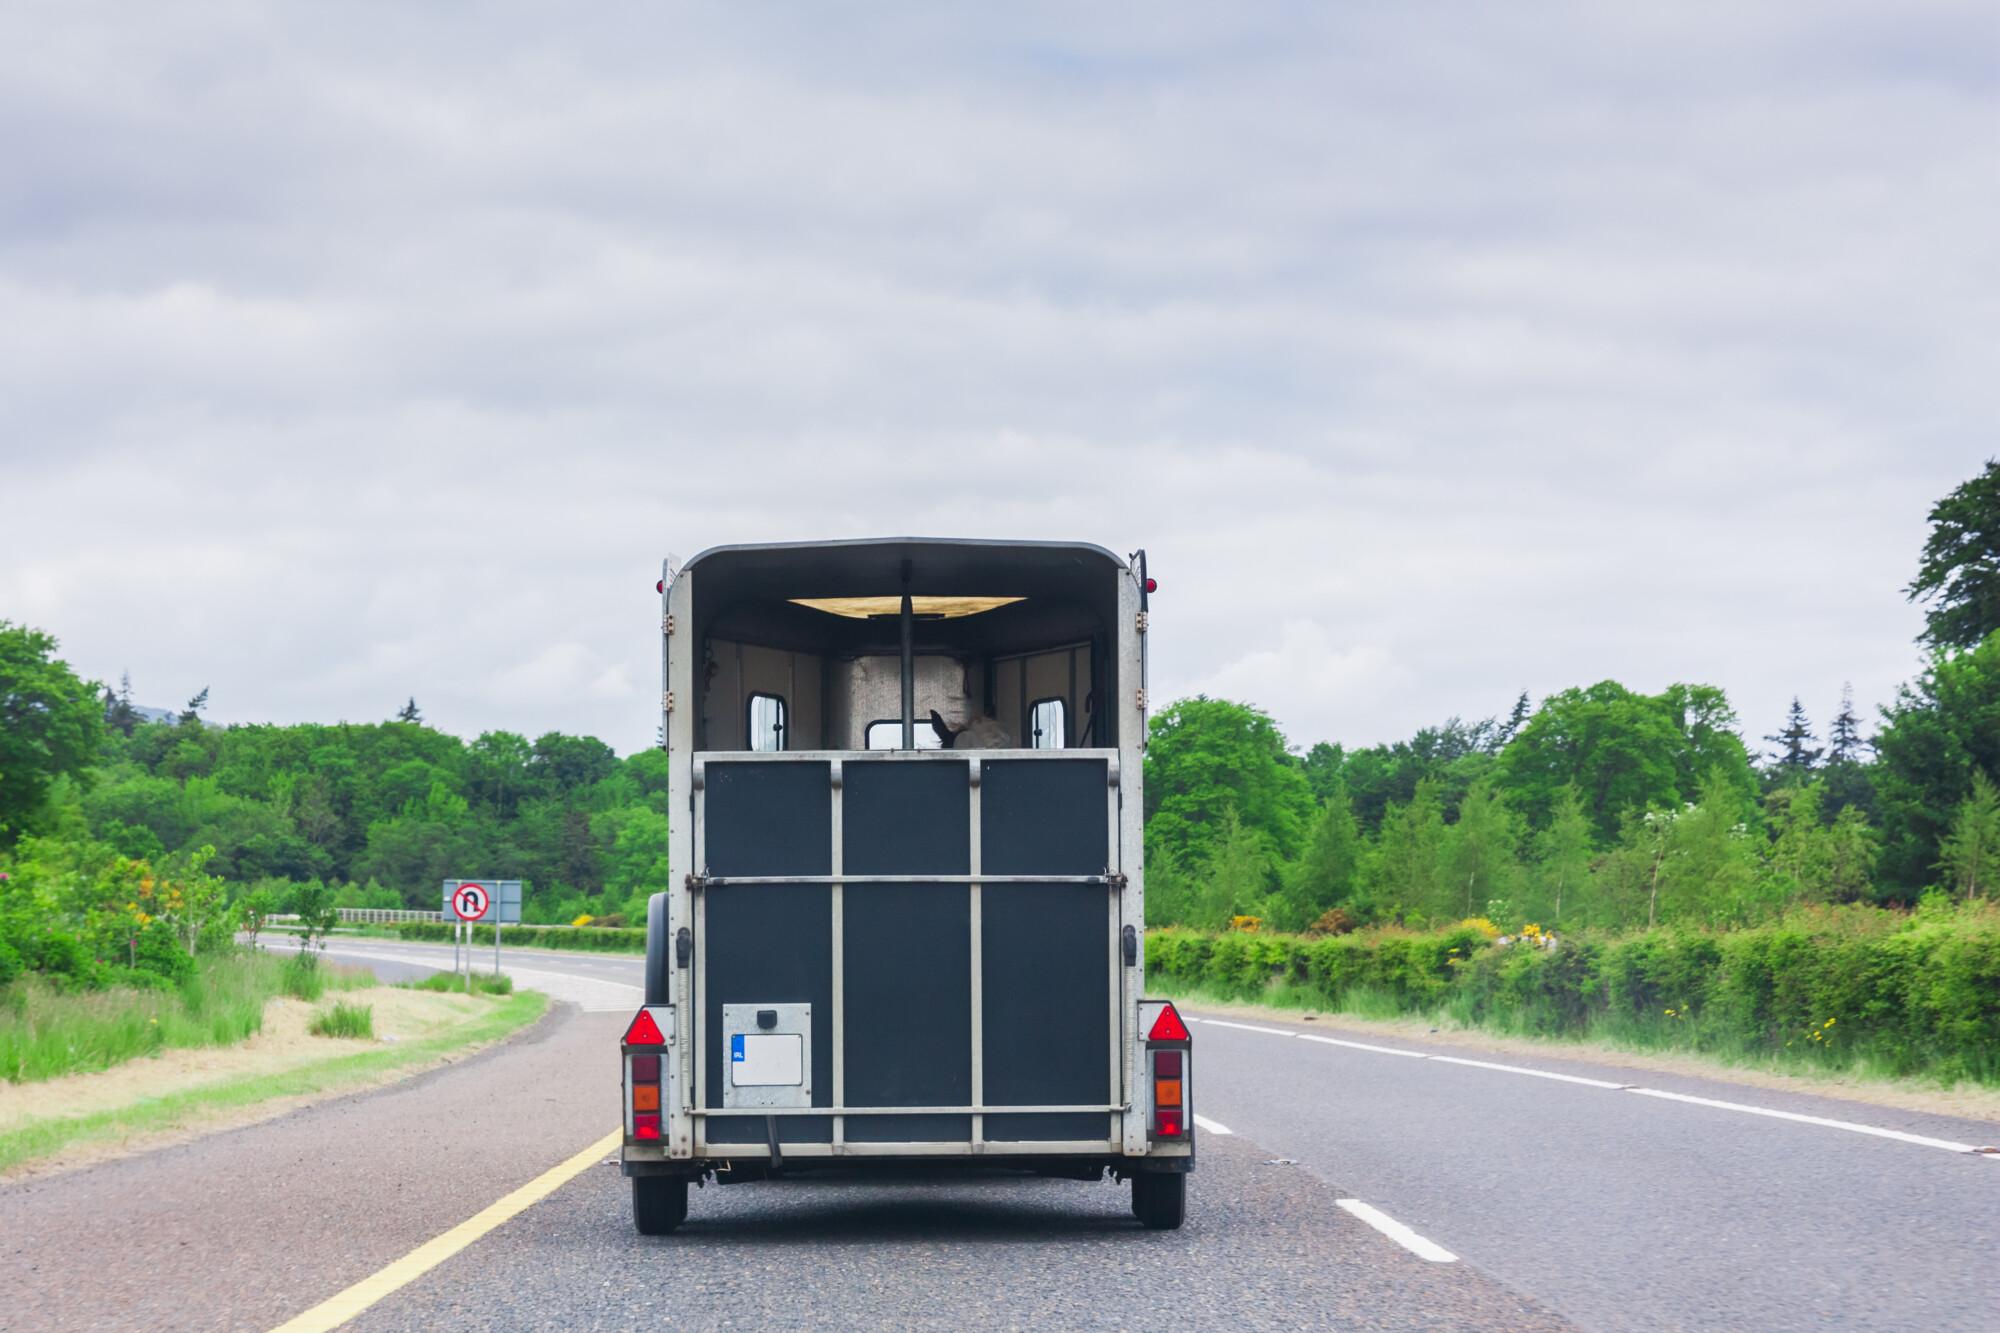 trailer law changes Uk. Horse transport on motorway.